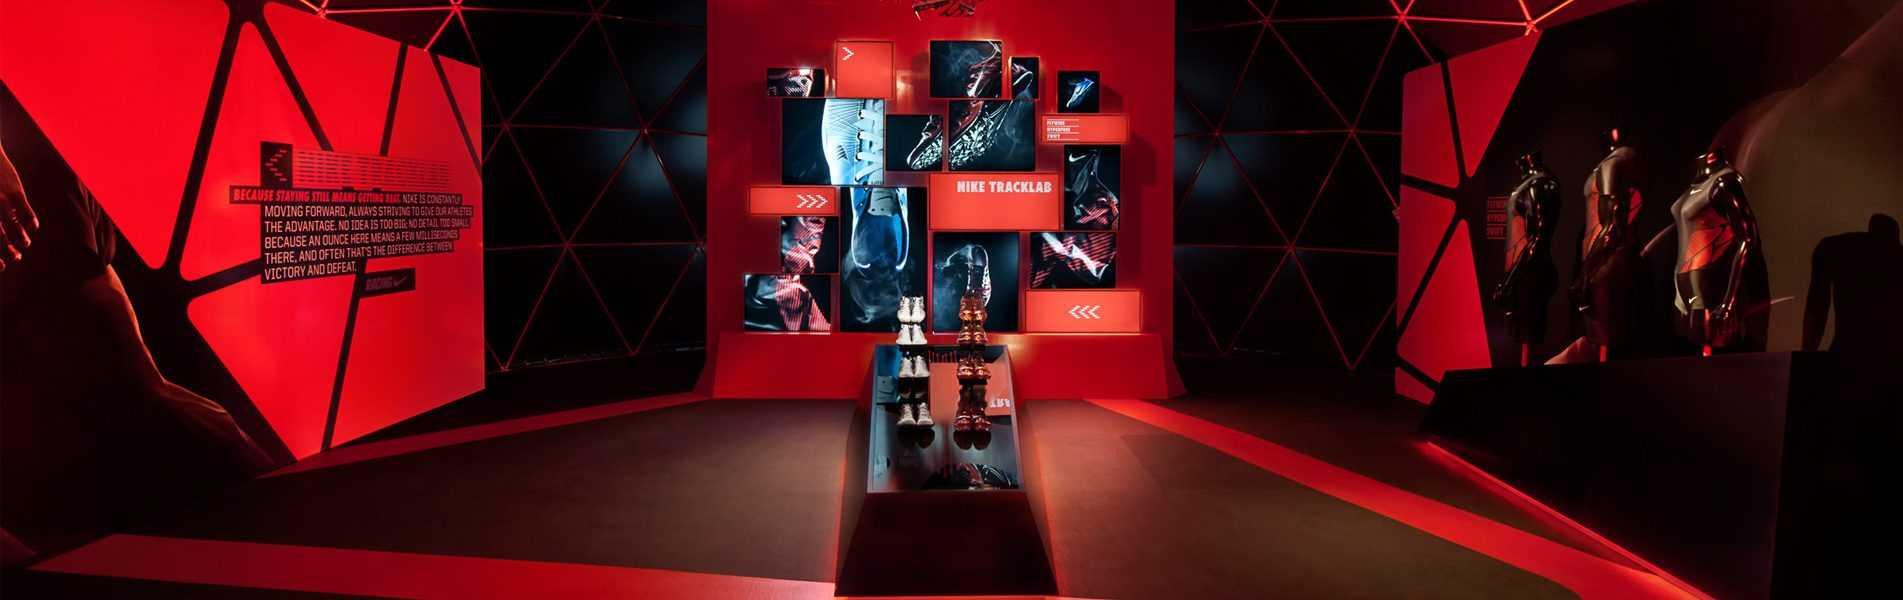 Nike Track Lab Dome